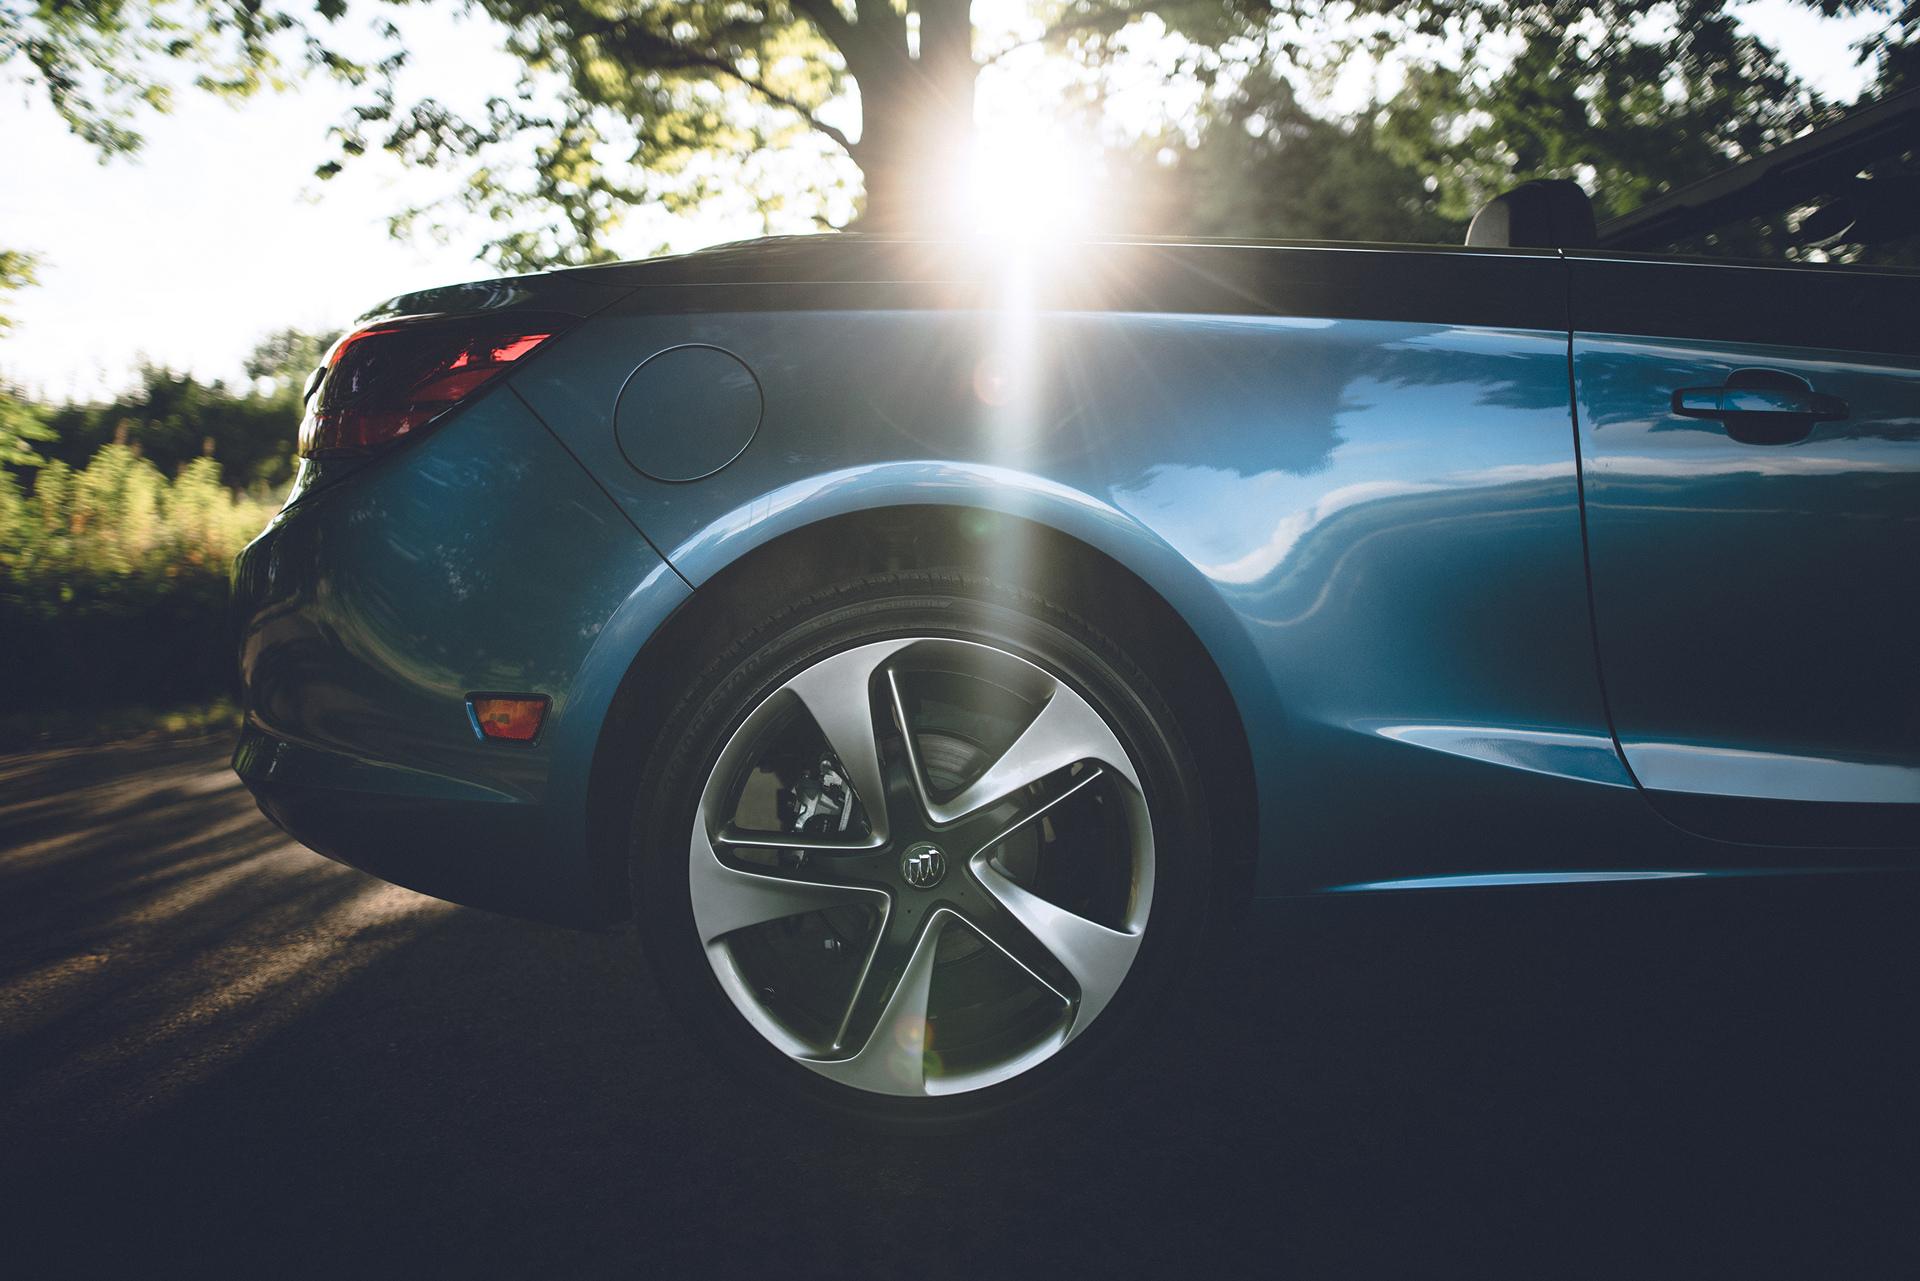 2017 Buick Cascada Sport Touring © General Motors